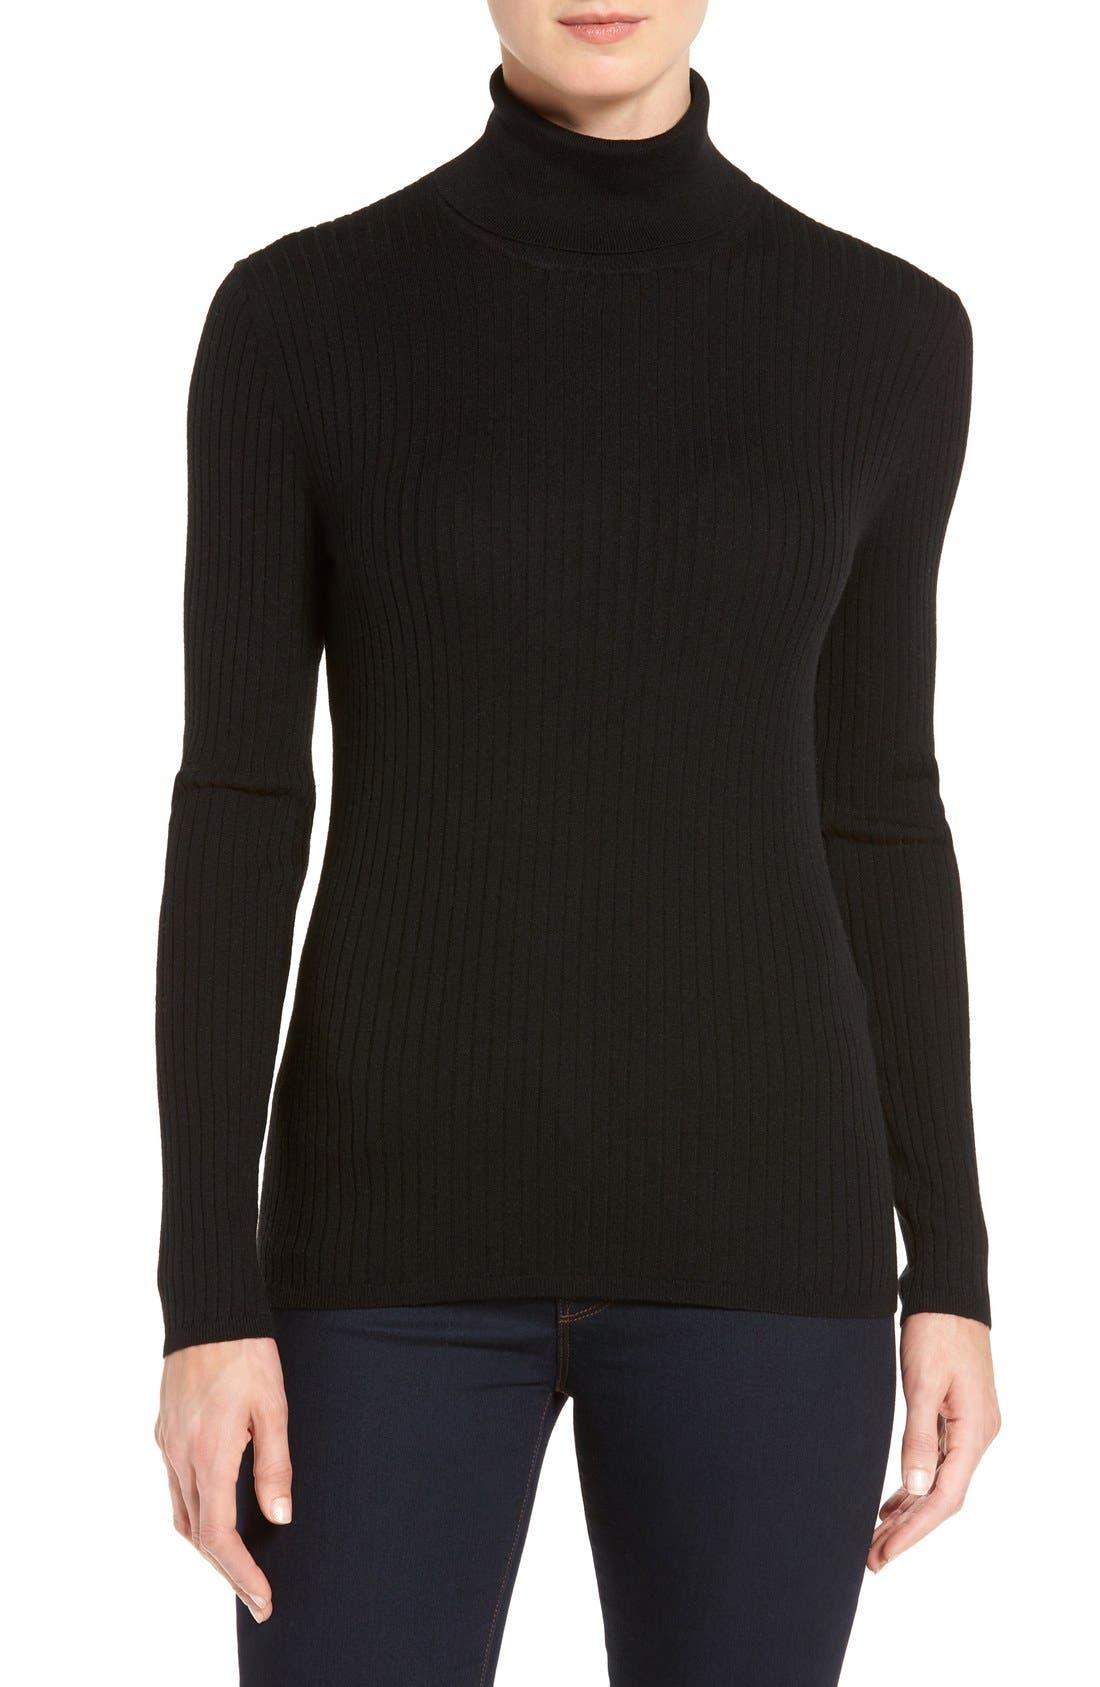 Main Image - Classiques Entier® Ribbed Turtleneck Sweater (Regular & Petite)